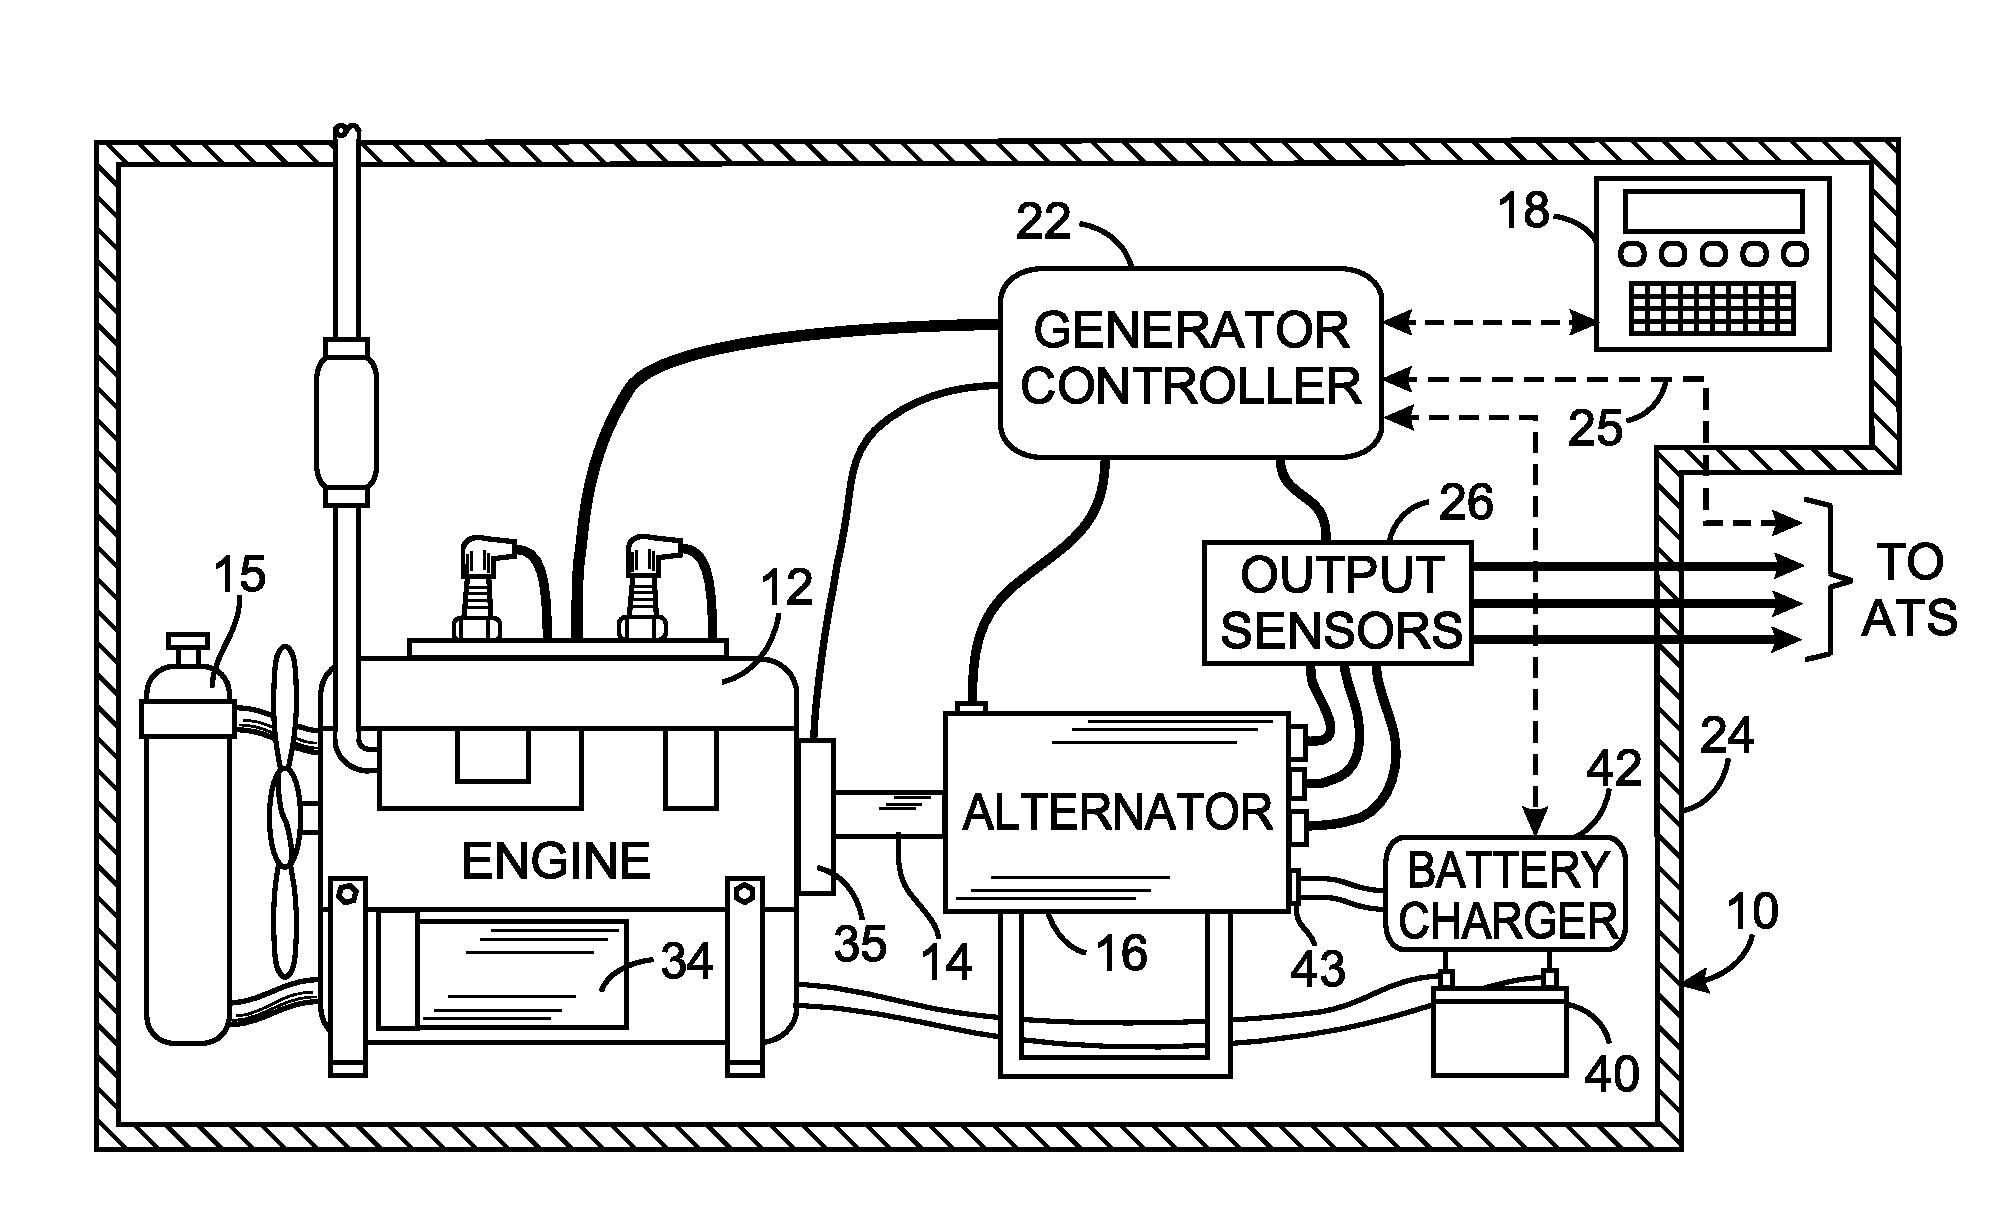 Wiring Diagram For Winpower Generator